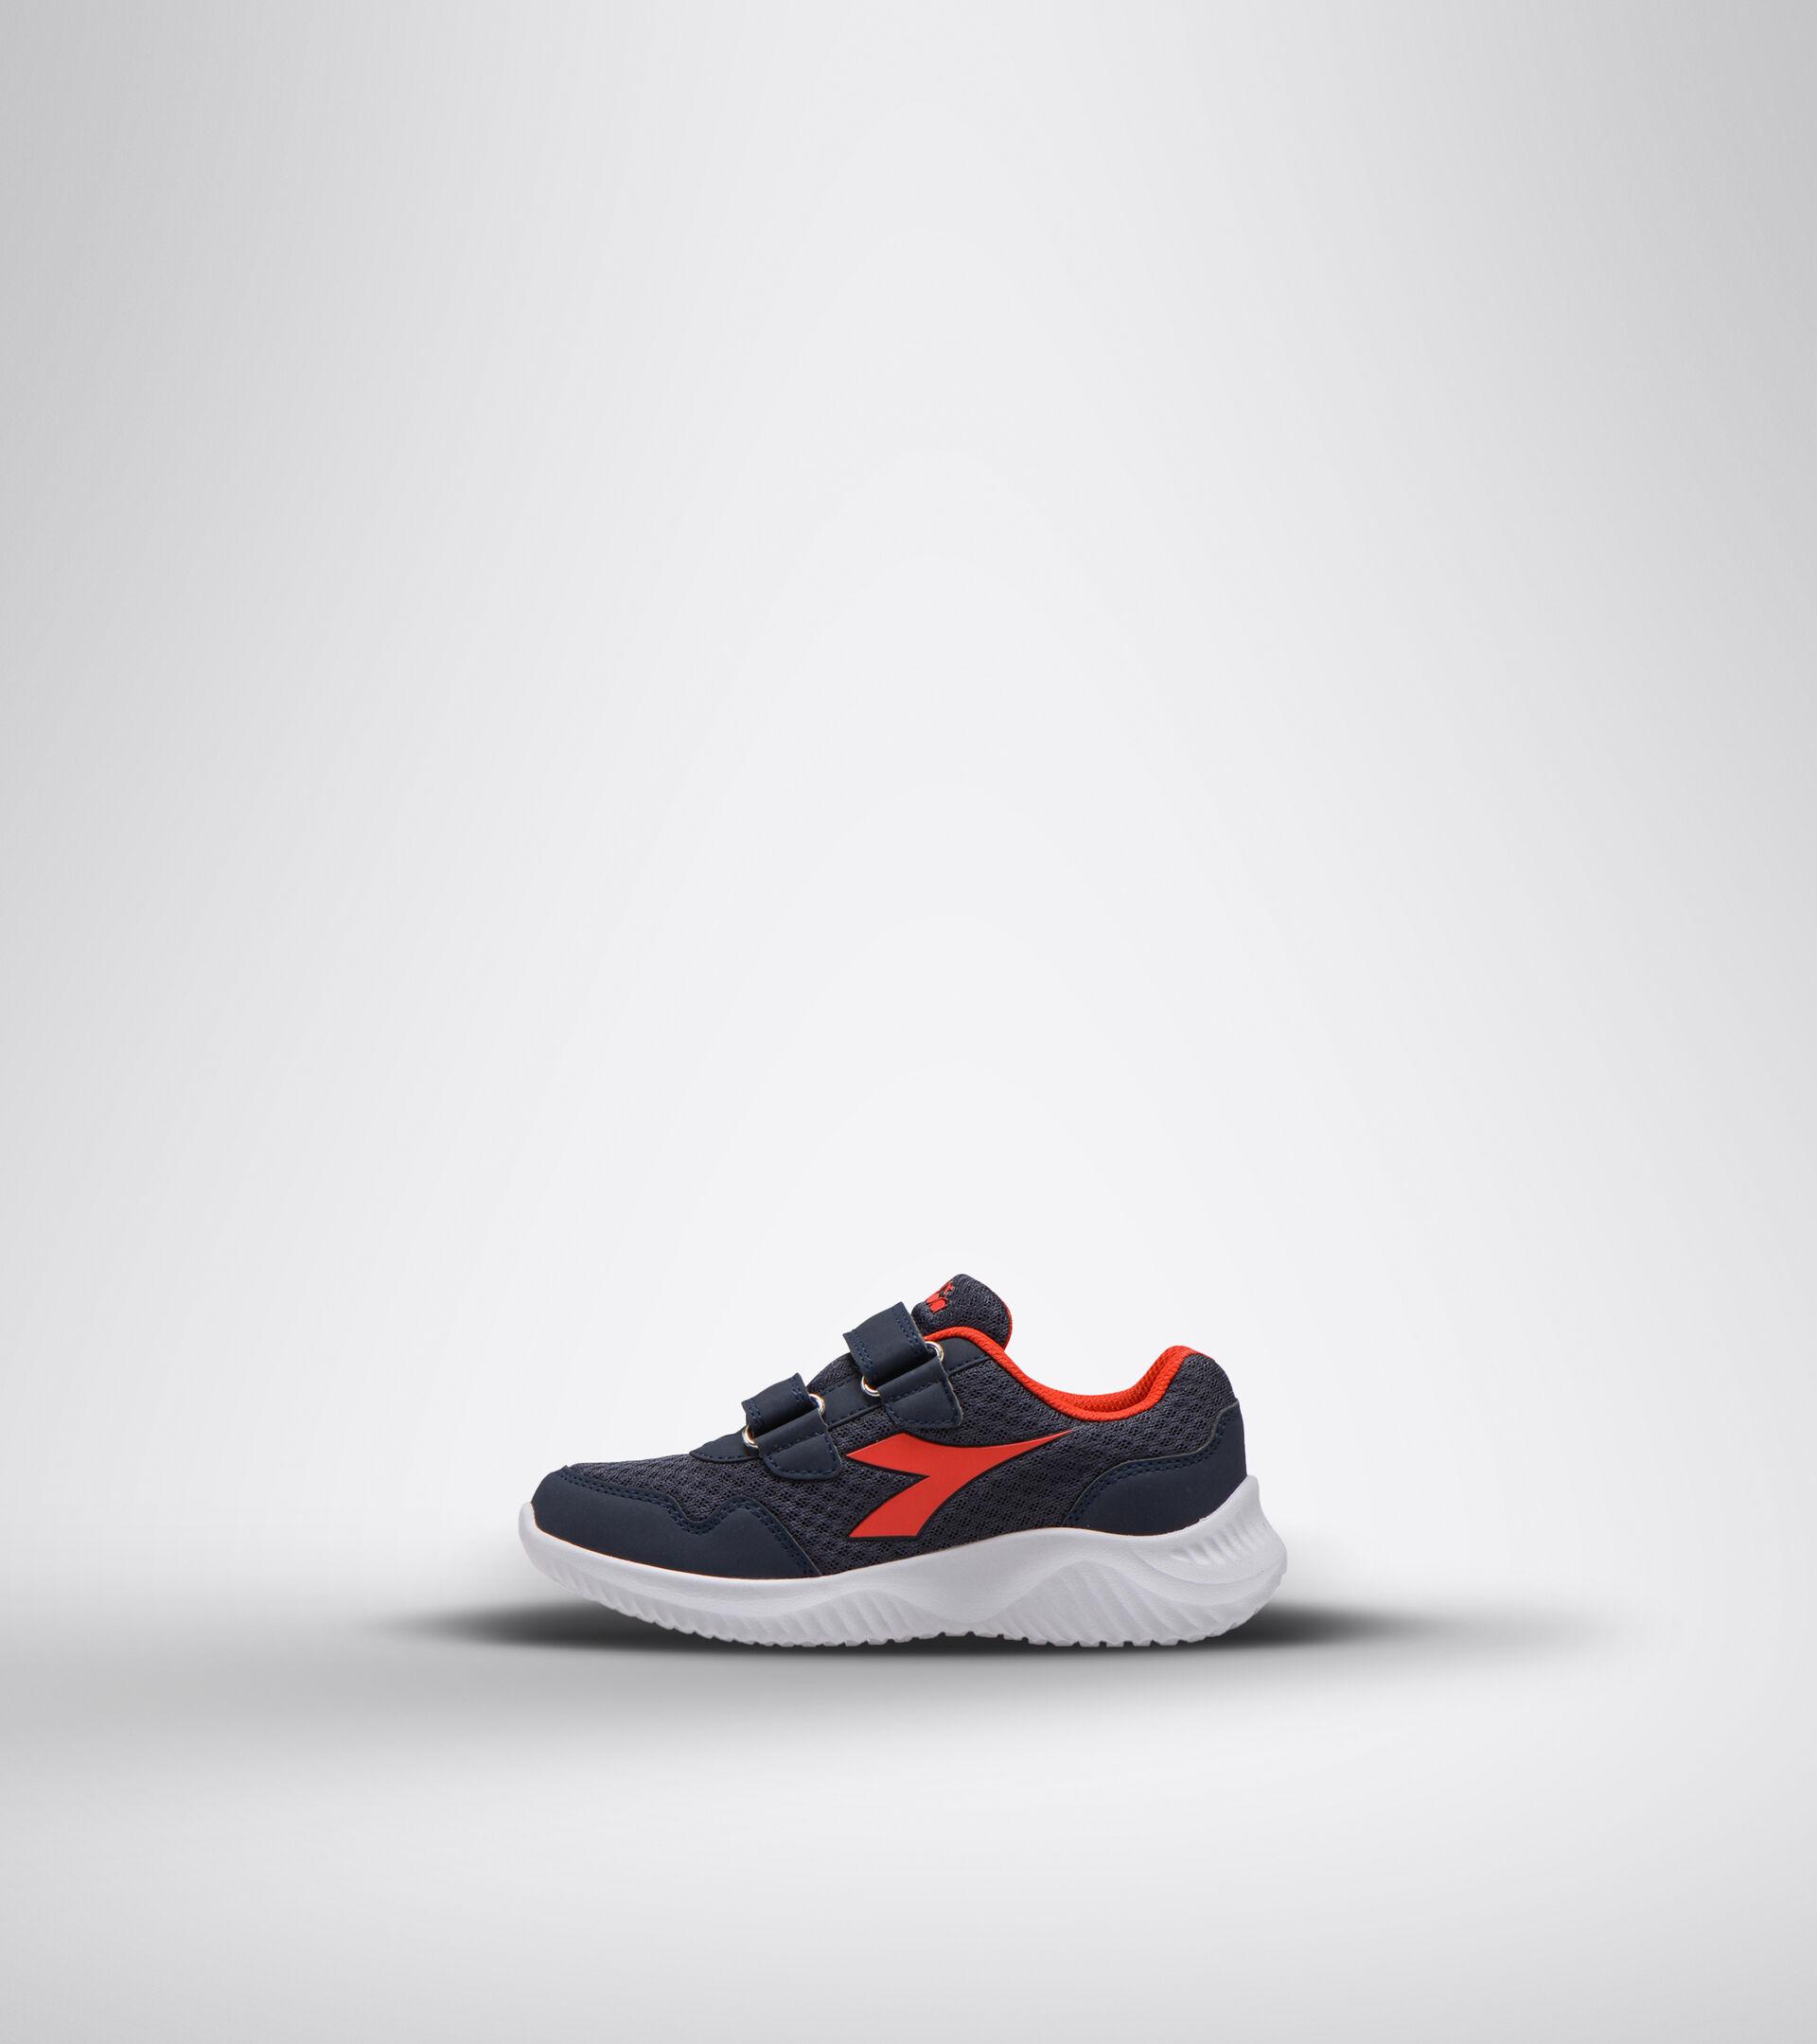 Chaussures de running - Unisexe enfant ROBIN 2 JR V BLEU DOMAINE/ROUGE HAUT RISQUE - Diadora